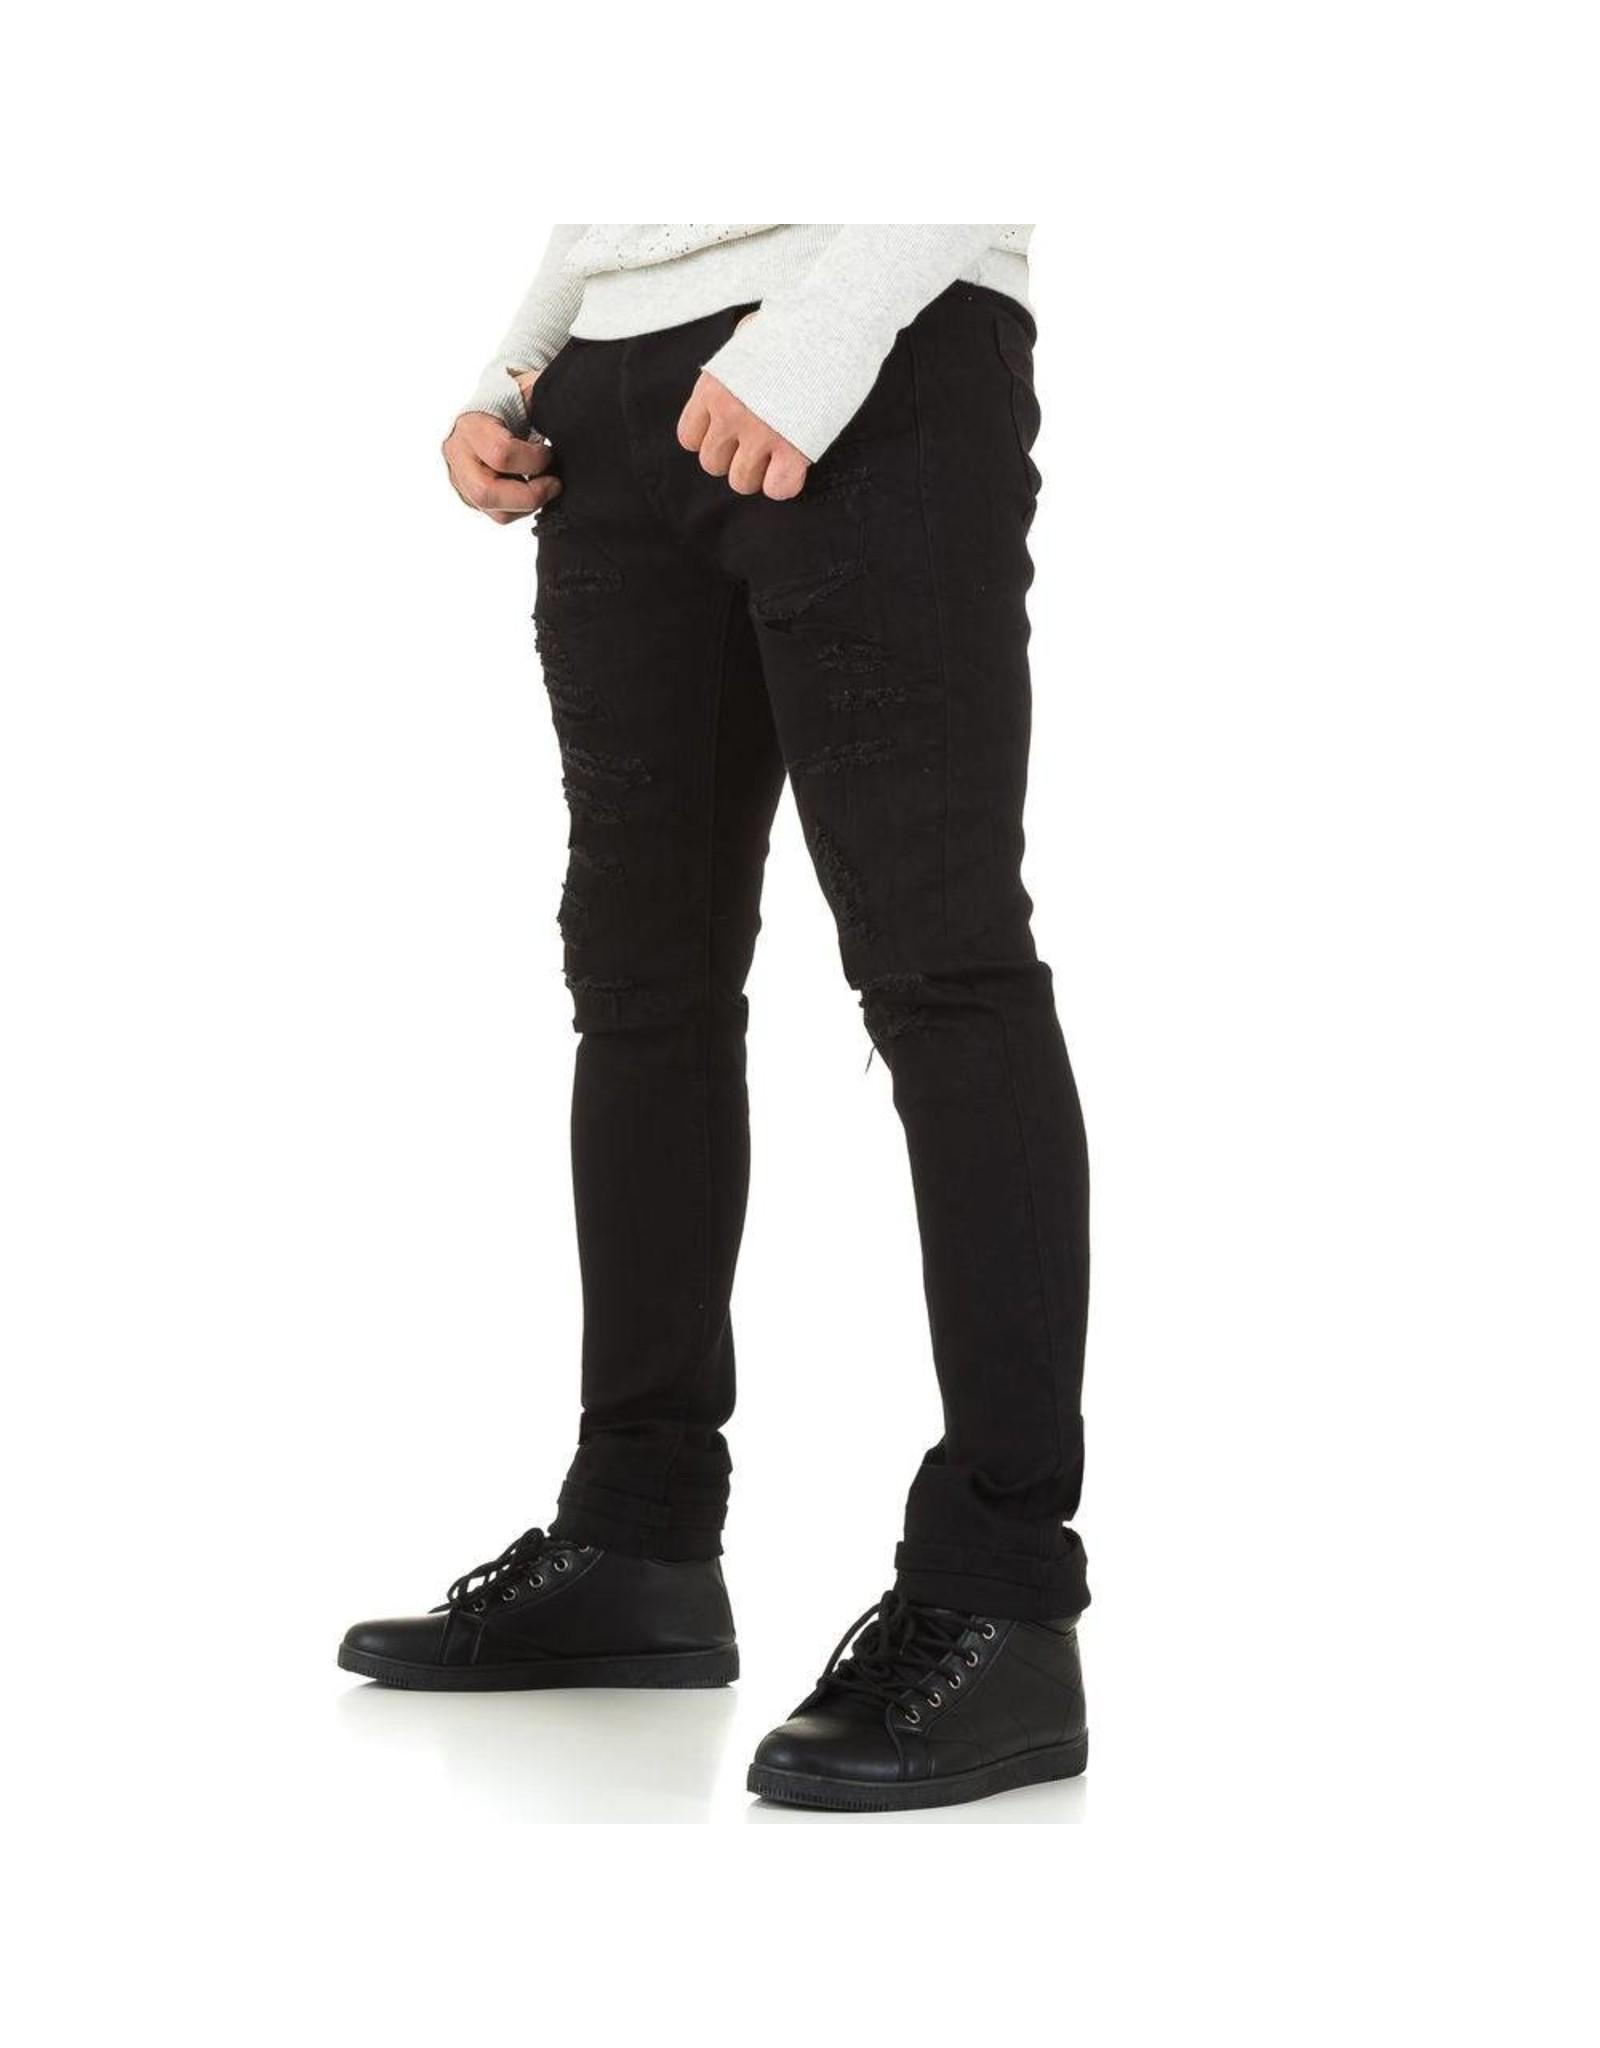 Herren Jeans von Sothtnk